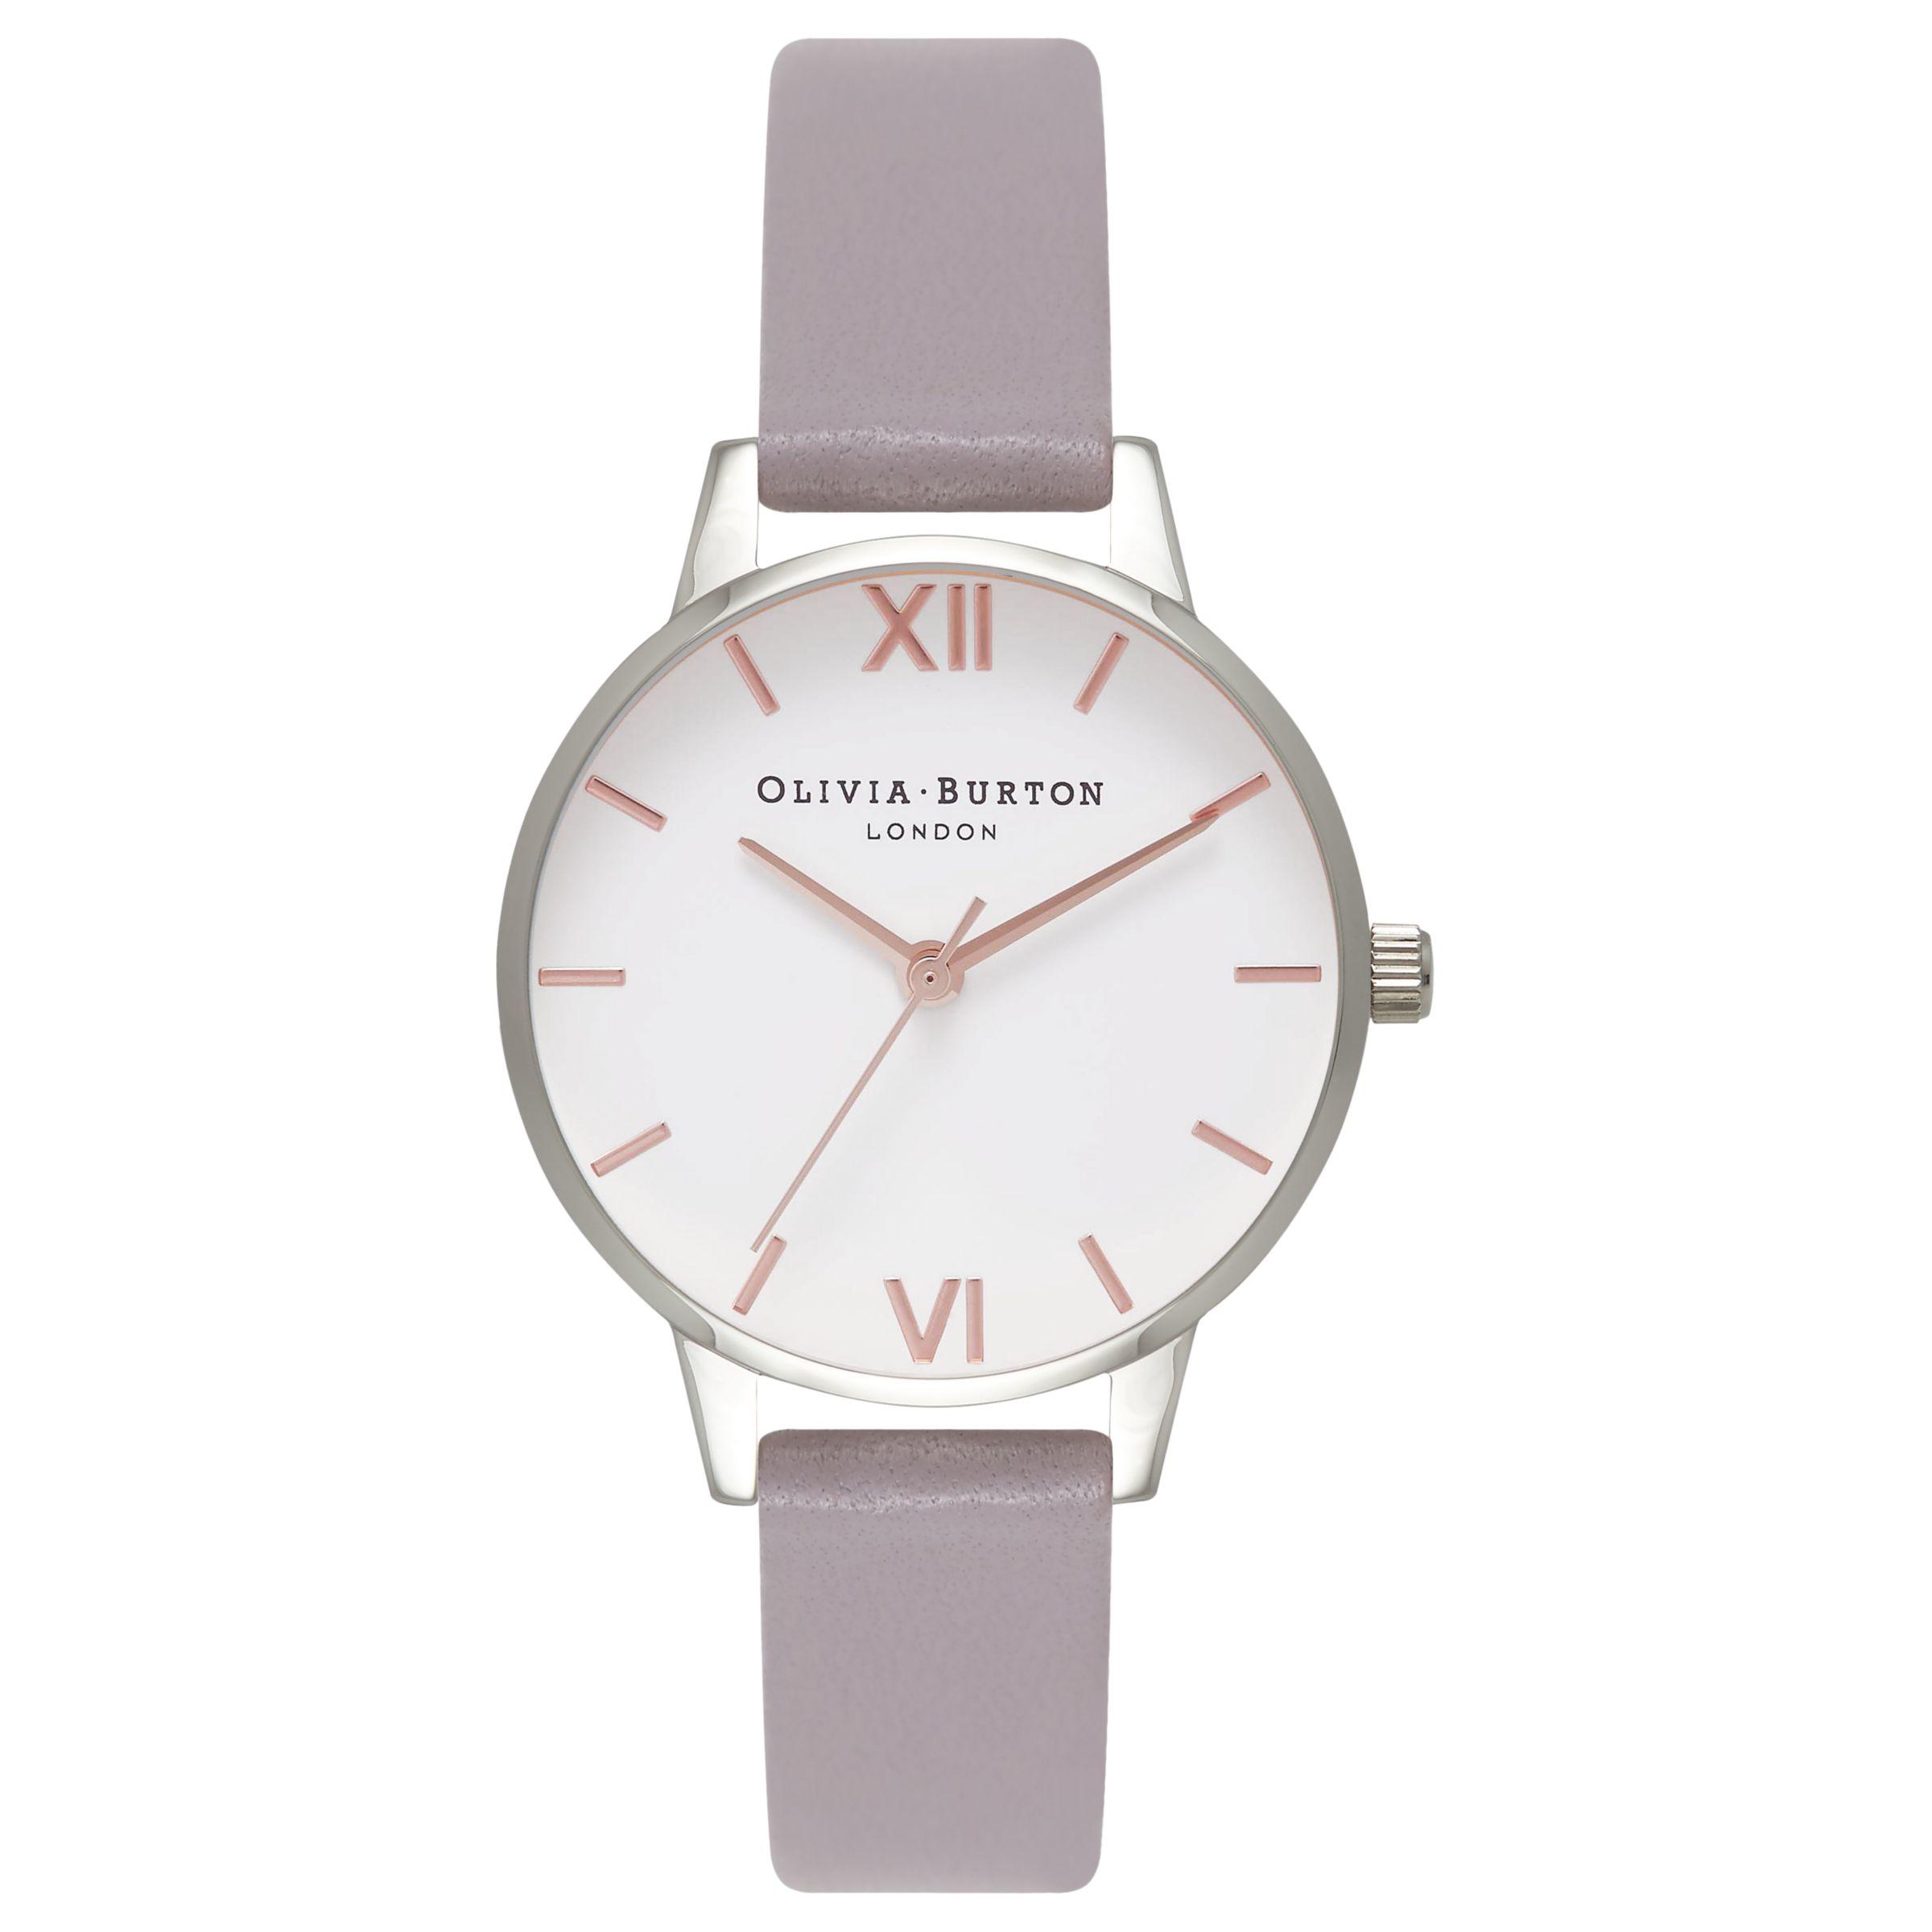 Olivia Burton Olivia Burton OB16MDW26 Women's Leather Strap Watch, Iced Lilac/Silver